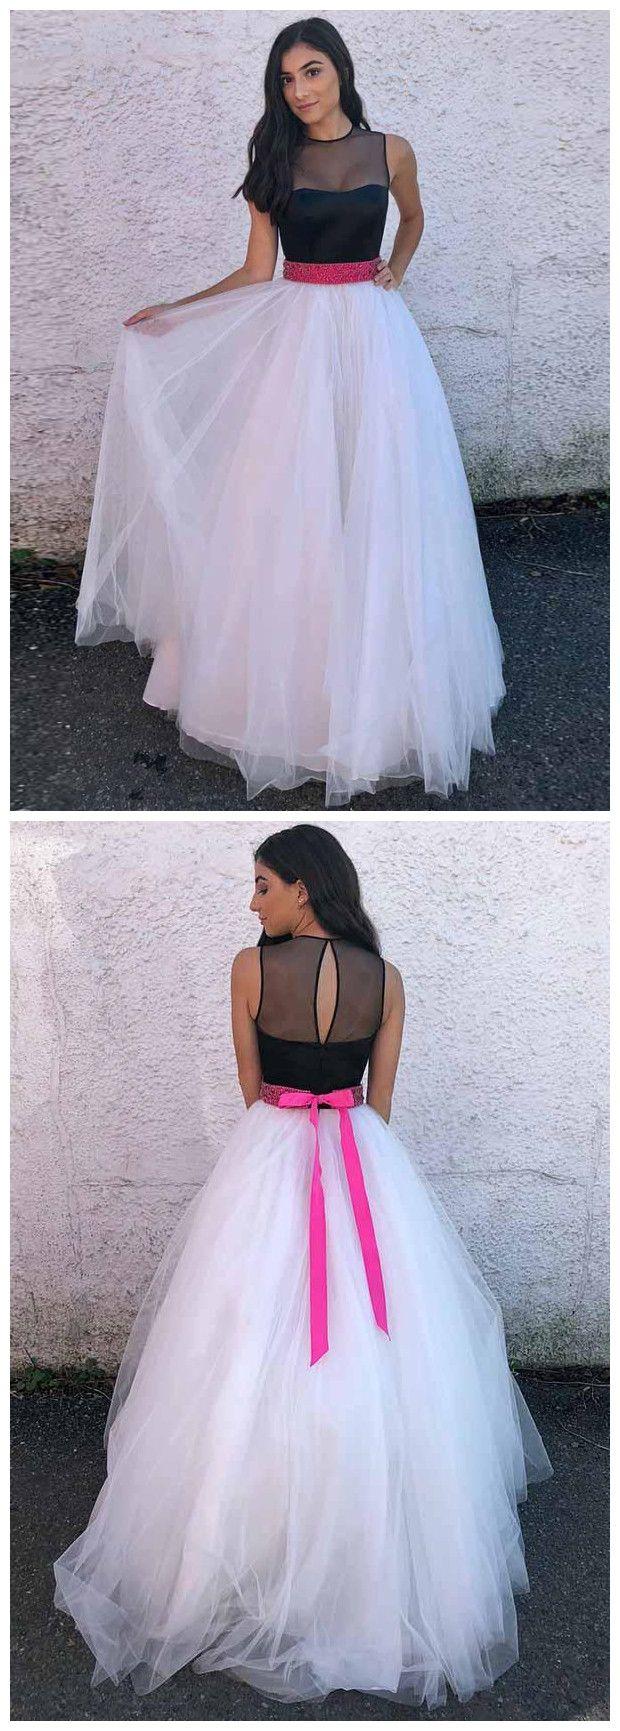 Aline scoop floor length white and black prom dress cheap long prom